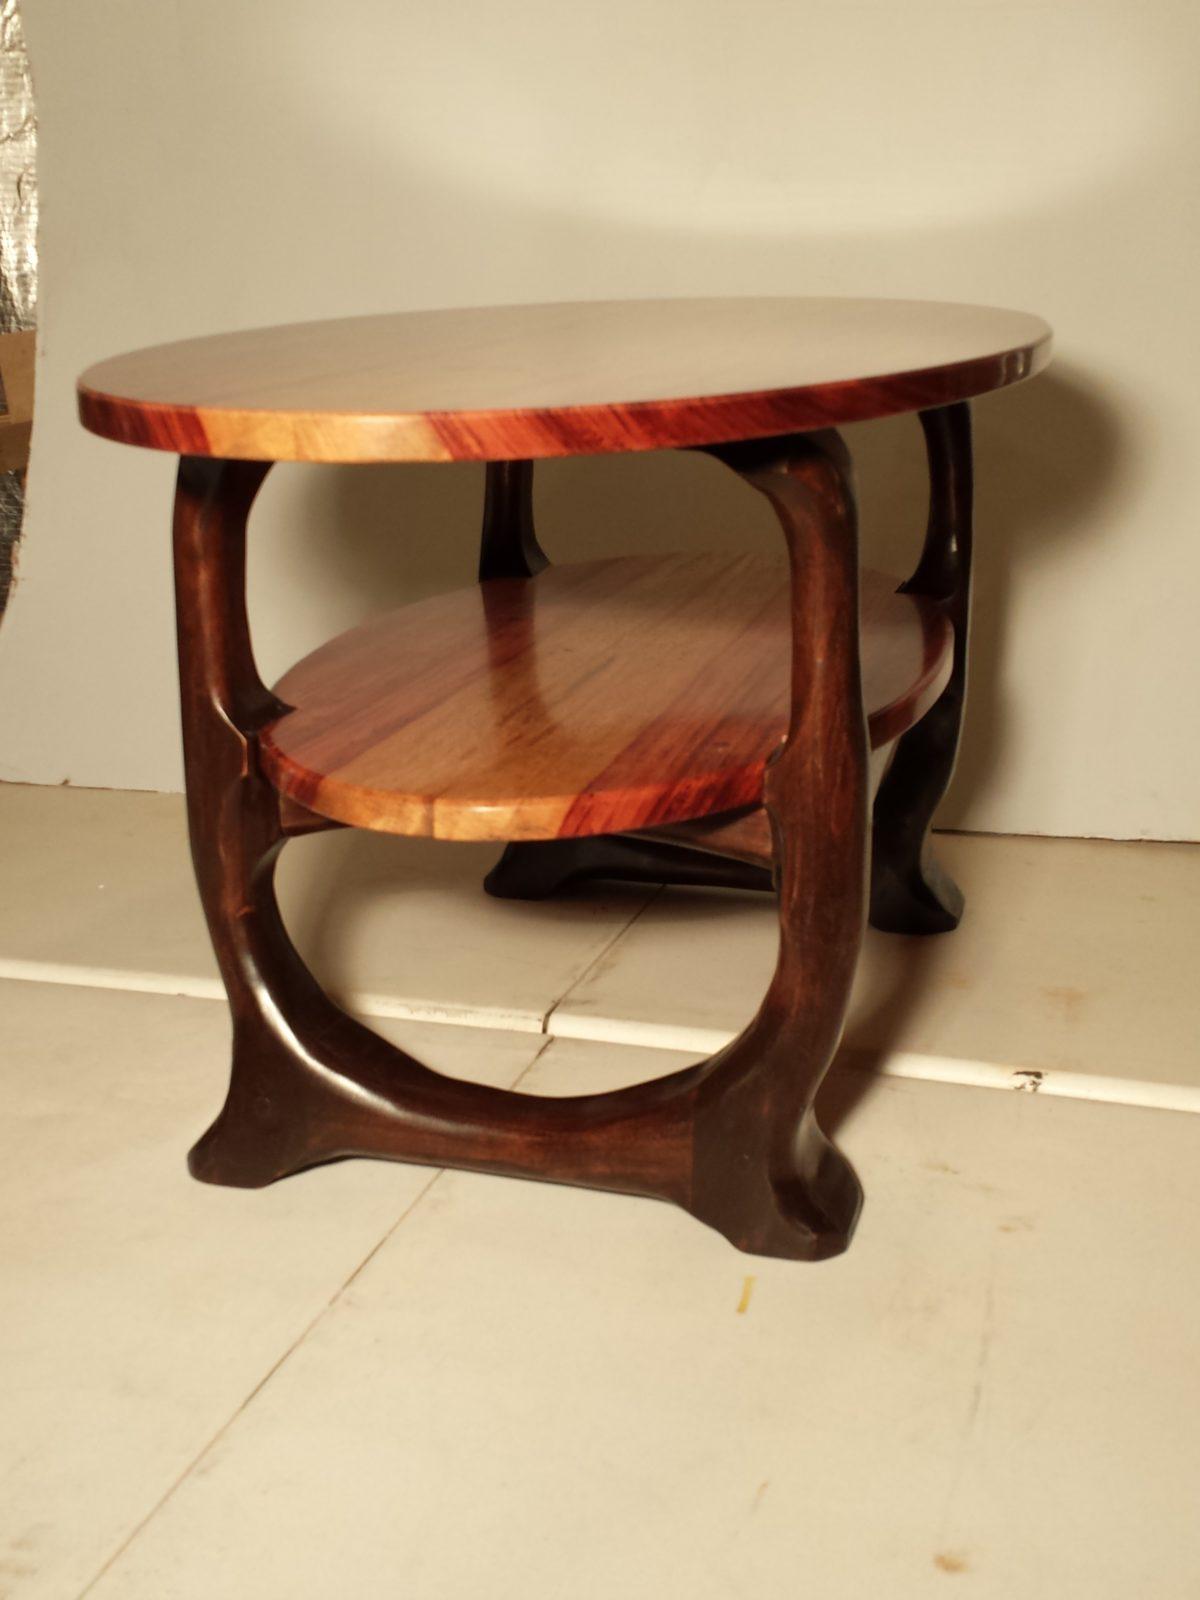 Bubinga and walnut coffee table FineWoodworking